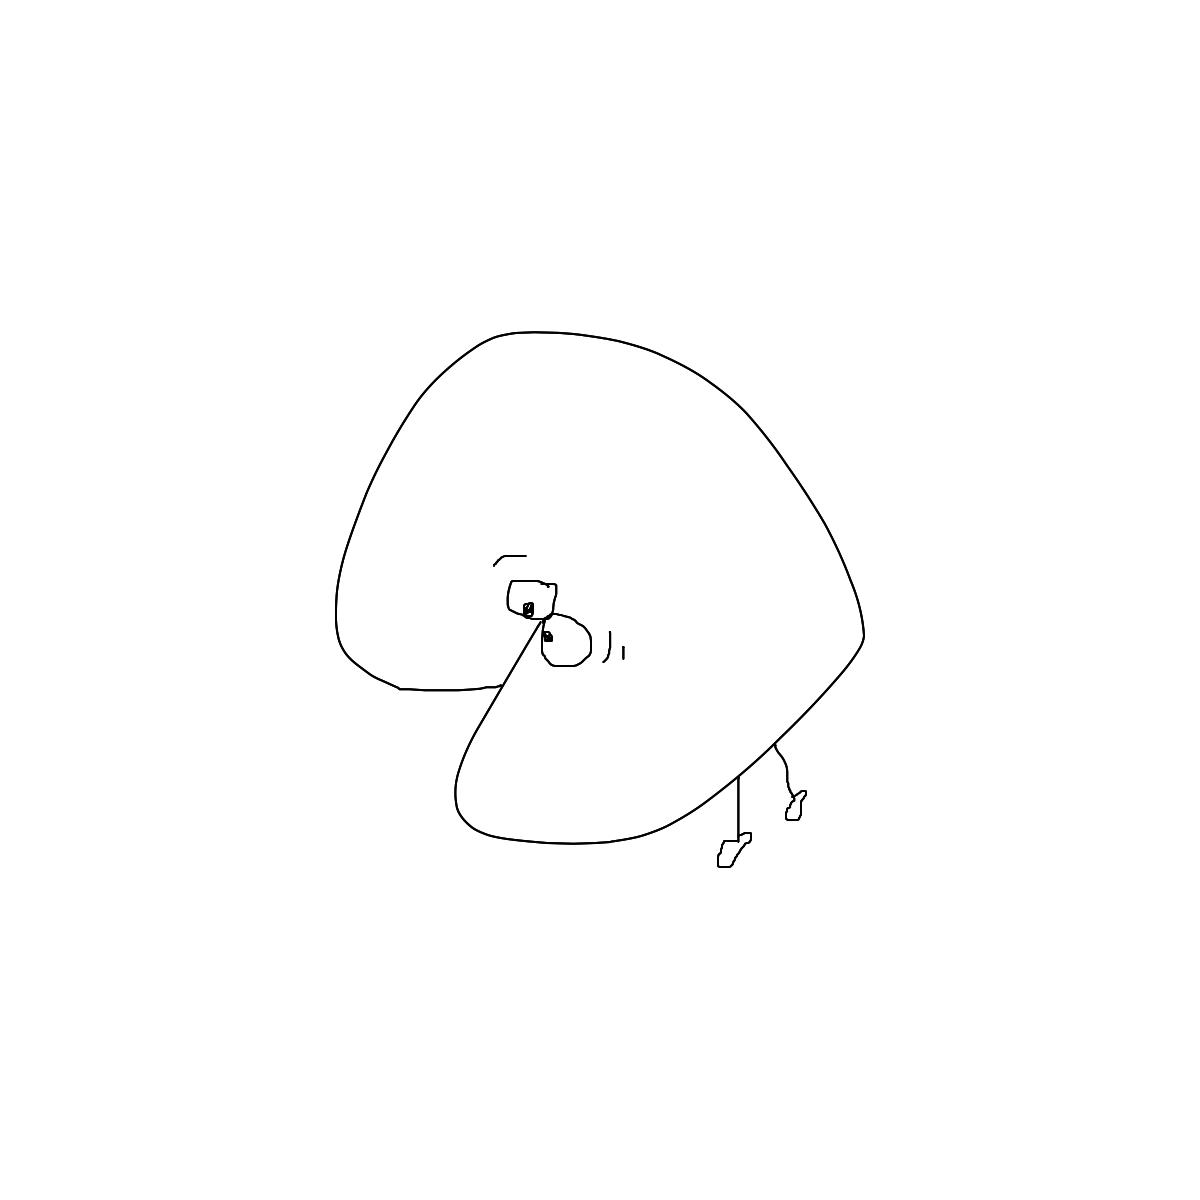 BAAAM drawing#31 lat:52.3487091064453100lng: 13.6431560516357420